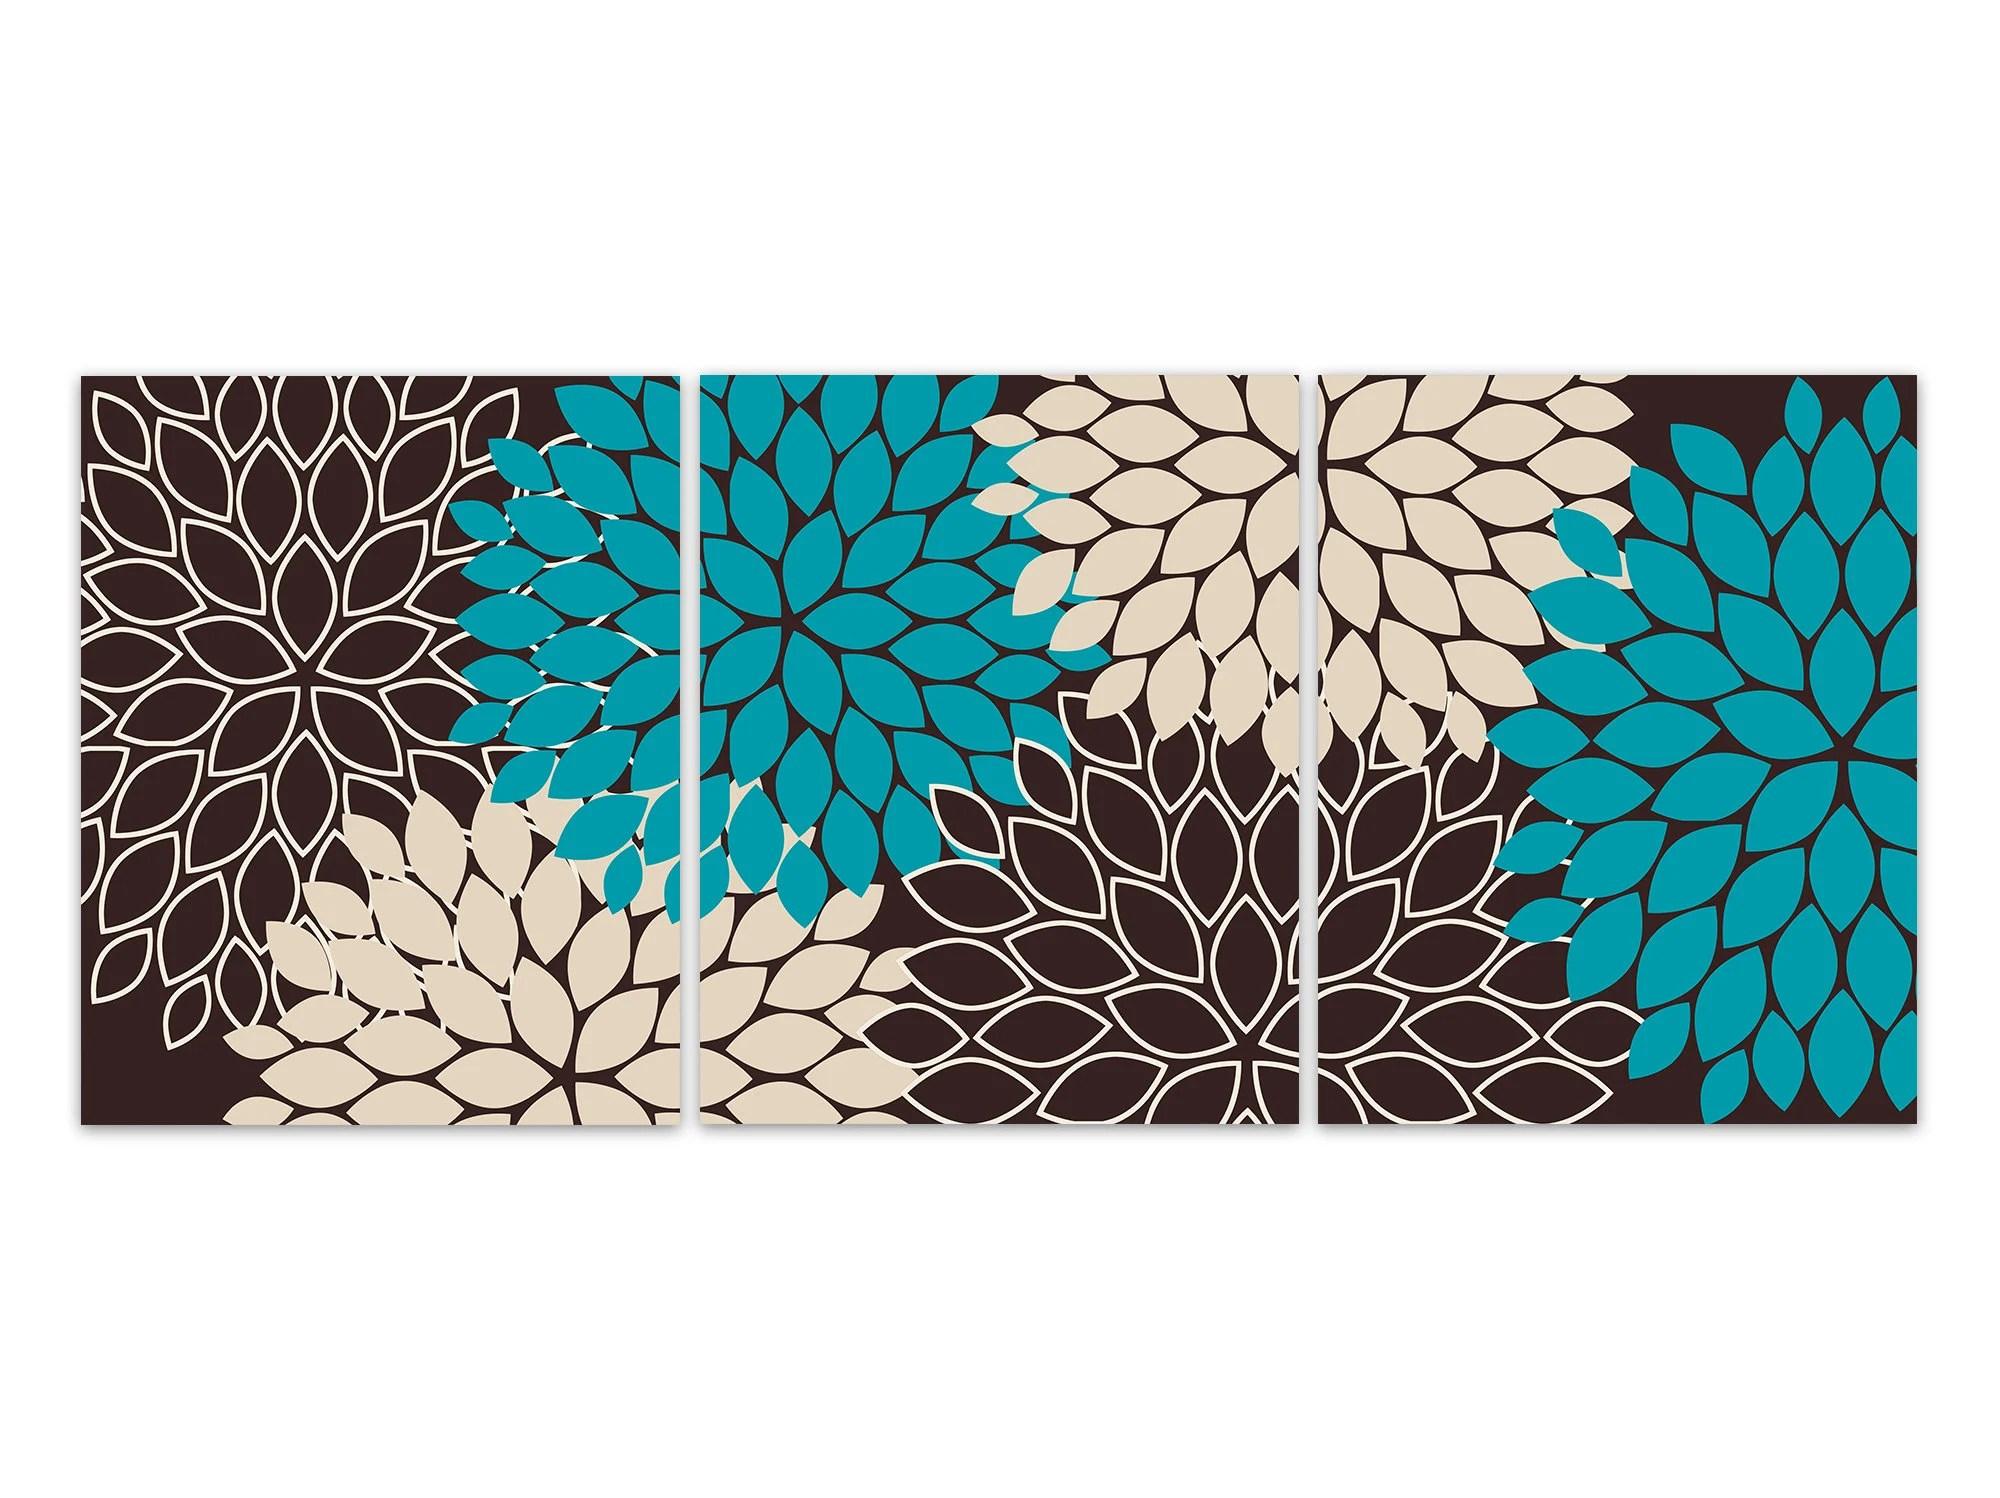 Home Decor Wall Art Prints Or Canvas Teal Brown Tan Flower